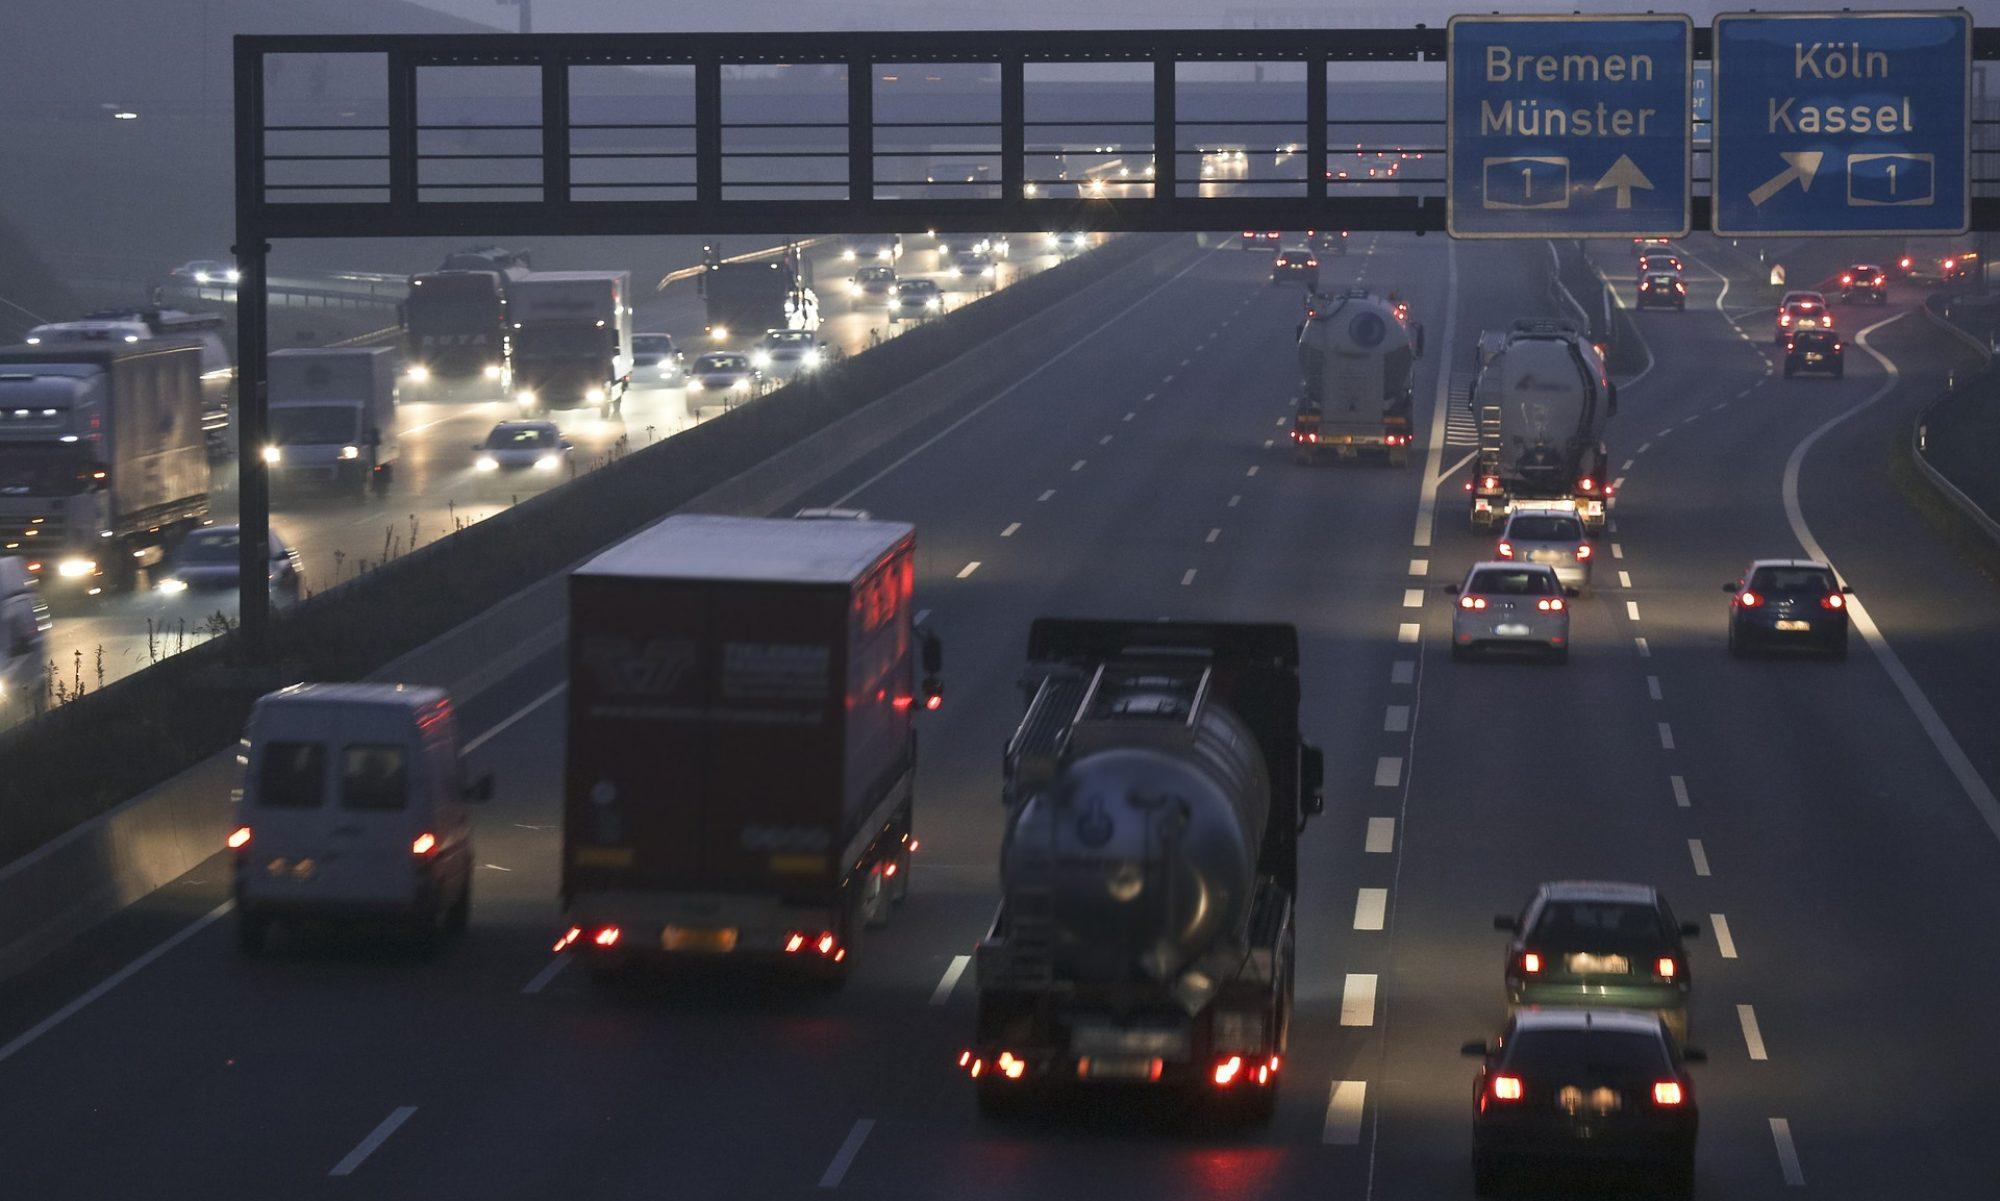 Polnische Kraftfahrer